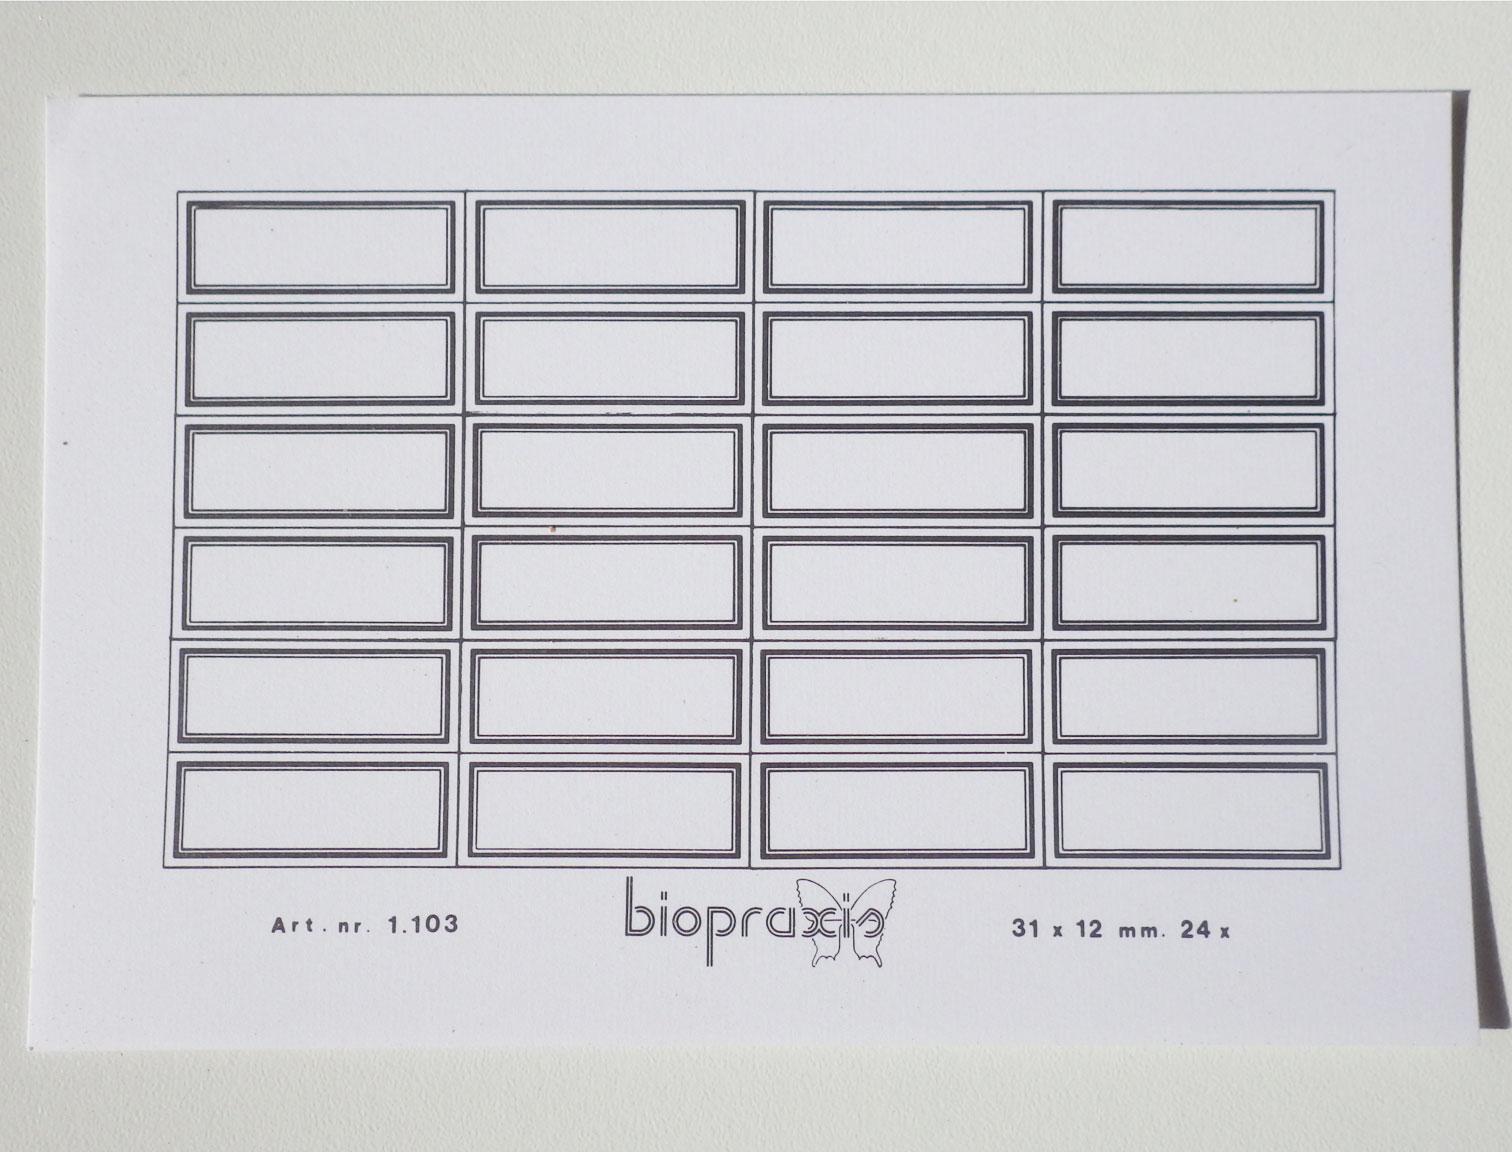 biopraxis-31x9-2